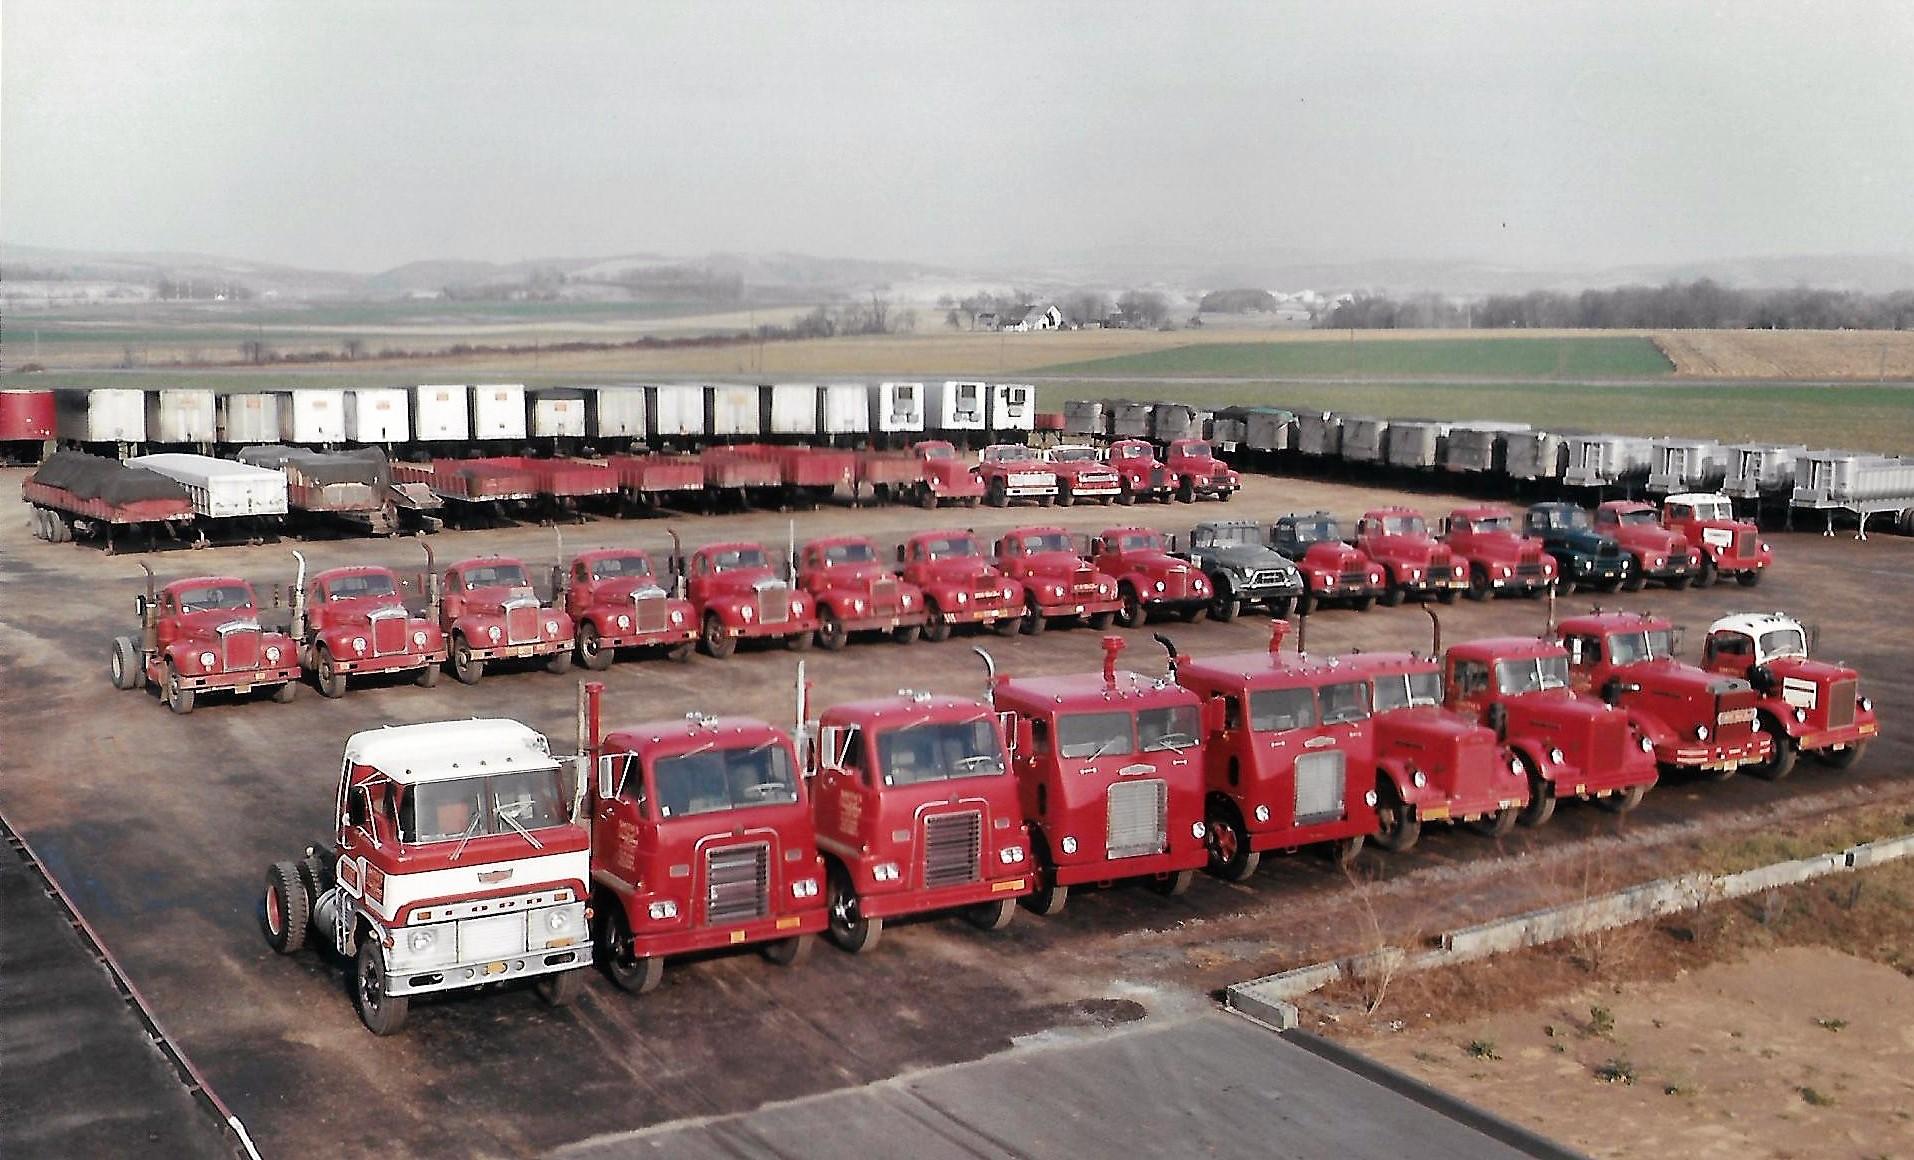 Smith-s-Truck-Lines-fleet--Muncy-Penna--1960